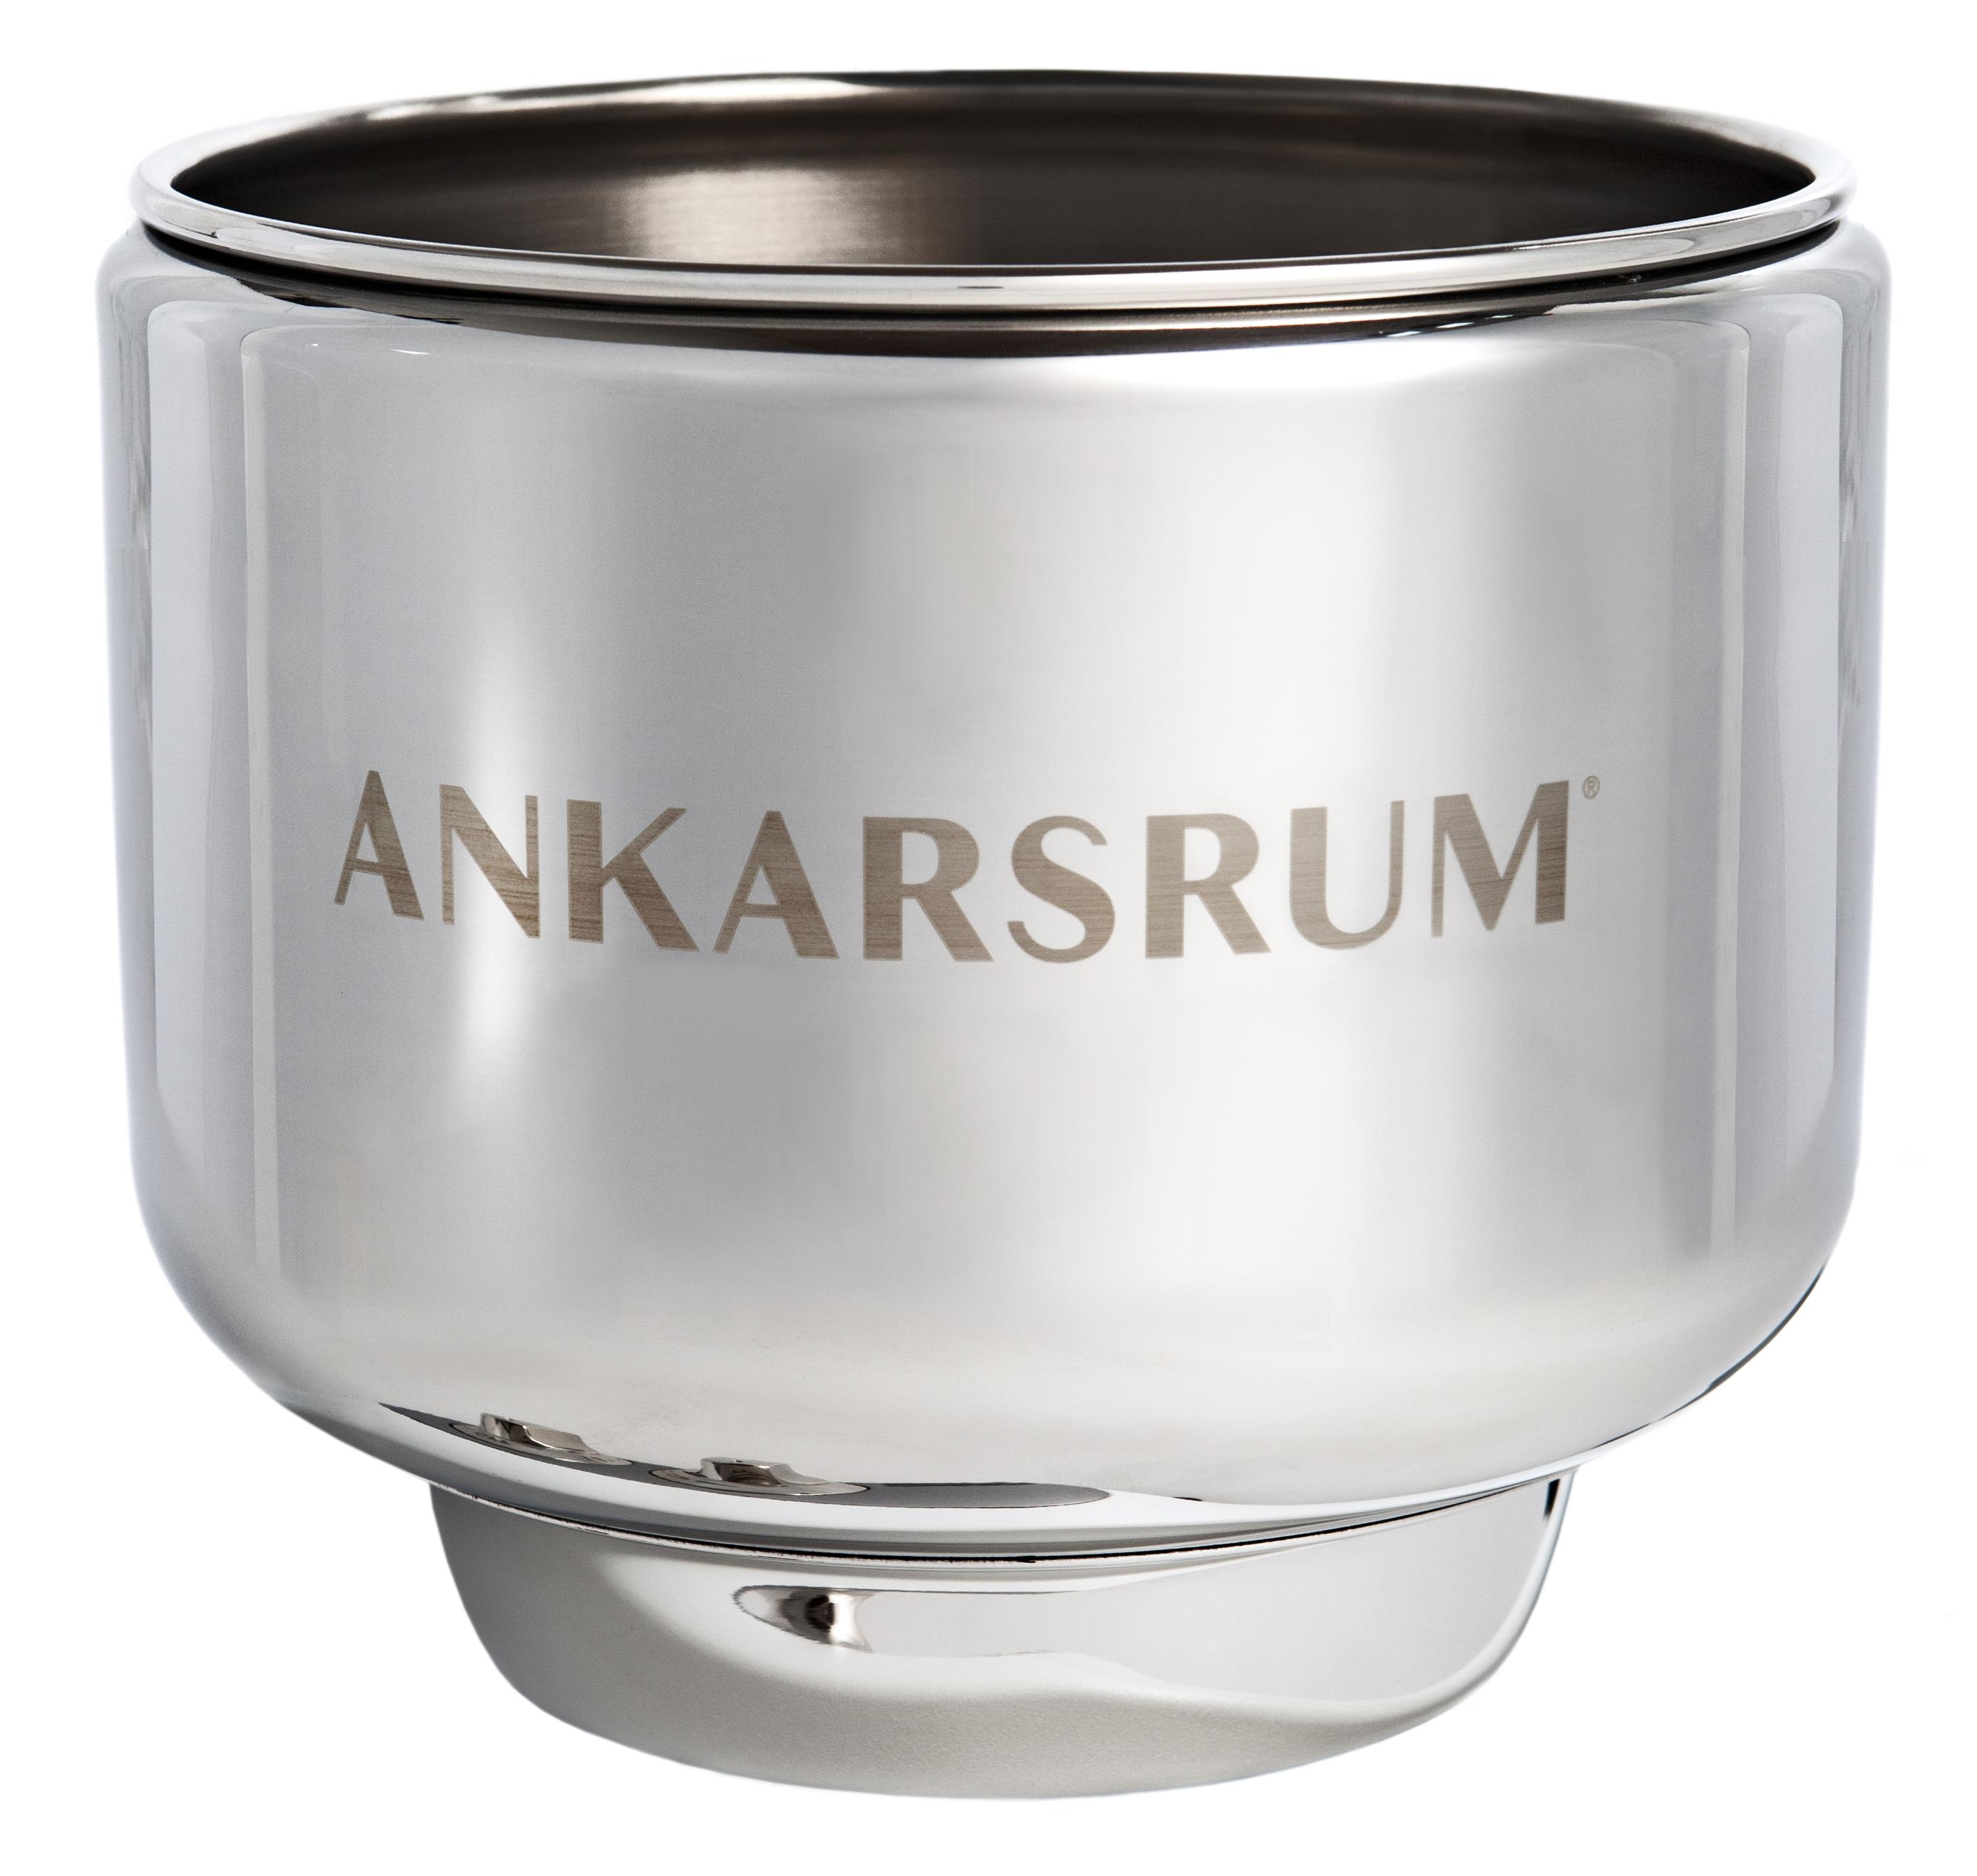 Ankarsrum Assistent Original Rostfri Skål 7 Liter